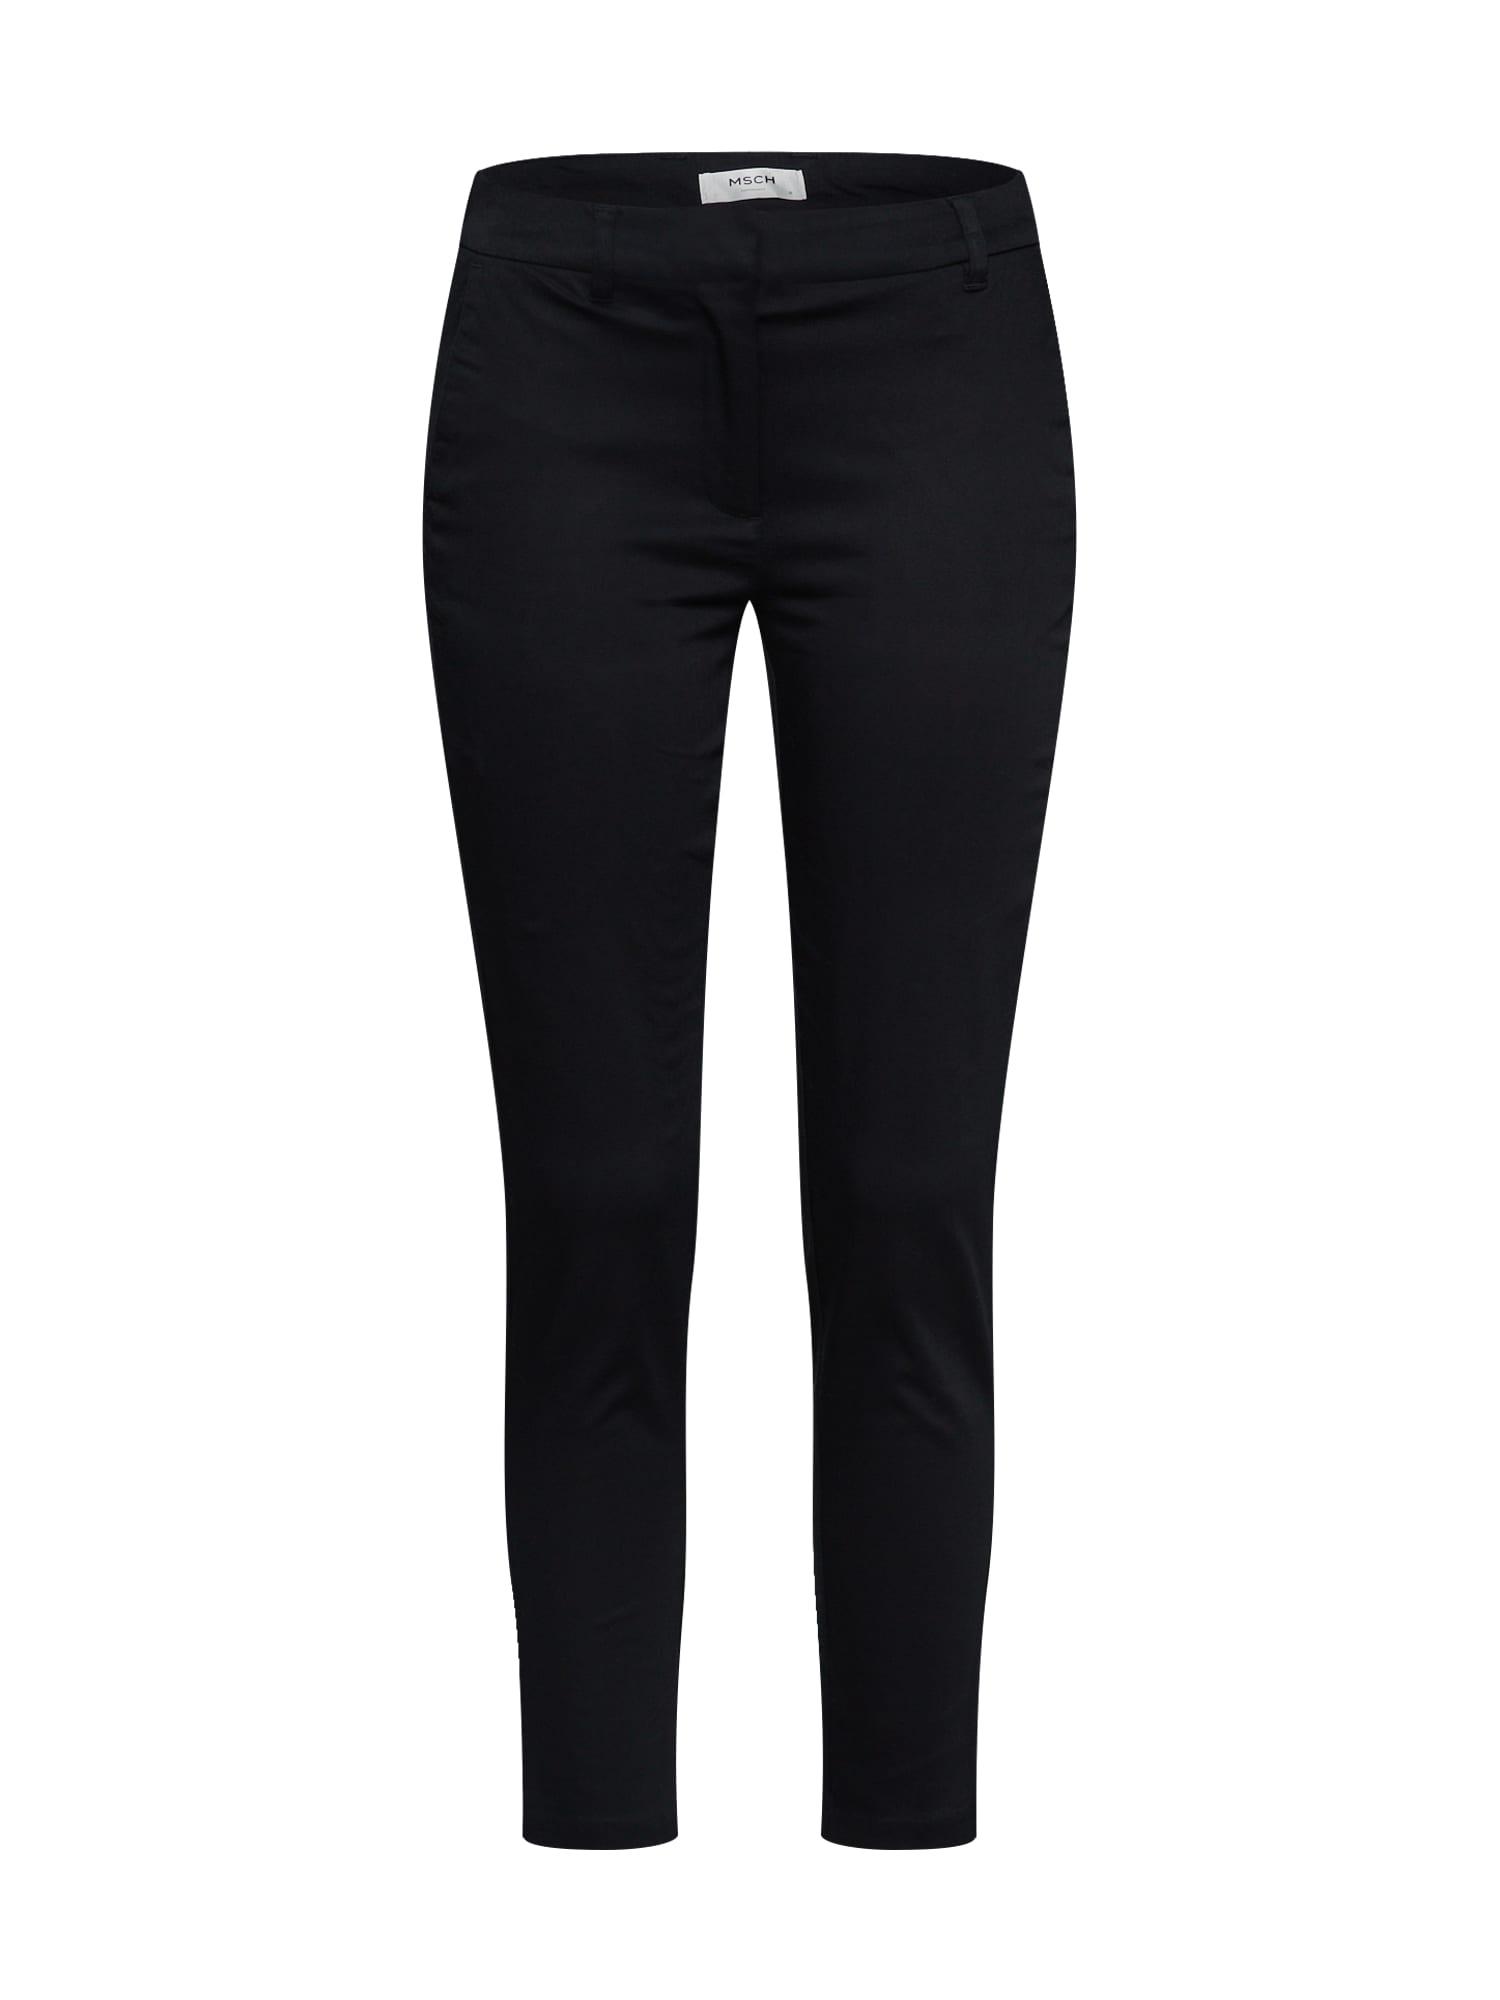 MOSS COPENHAGEN Chino stiliaus kelnės 'FINJA' juoda